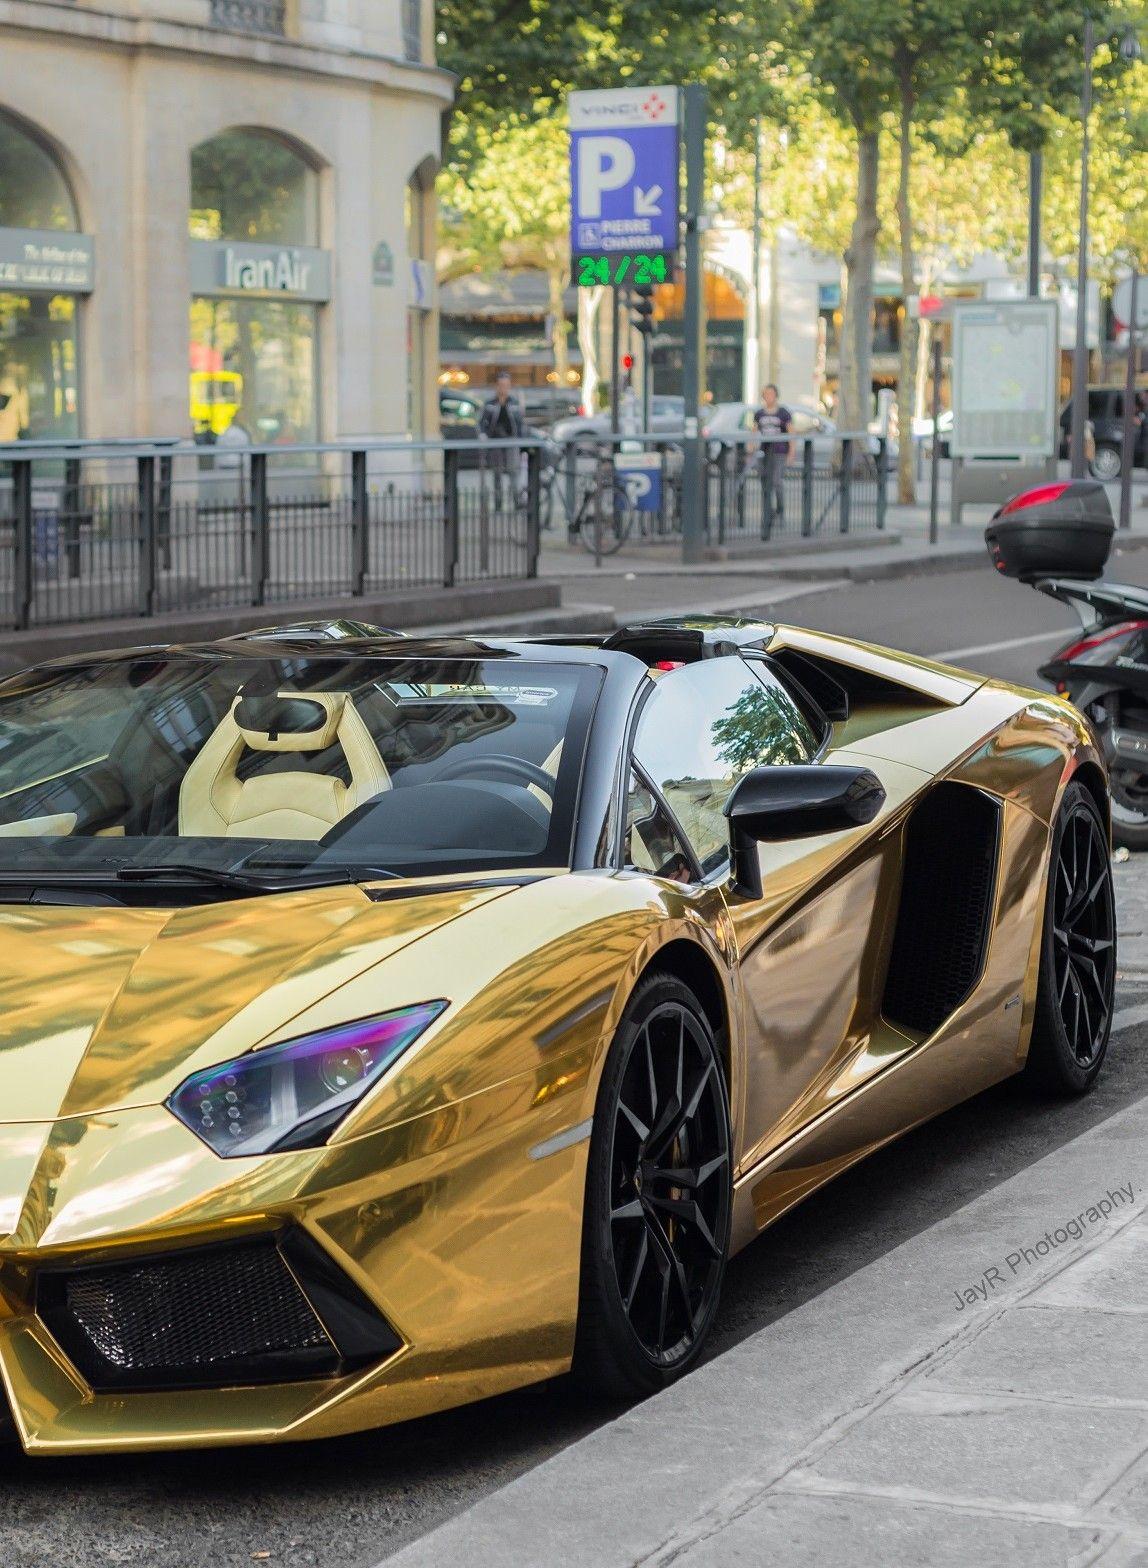 Lamborghini Aventador Gold Dingen Om Te Kopen Cars Luxury Cars